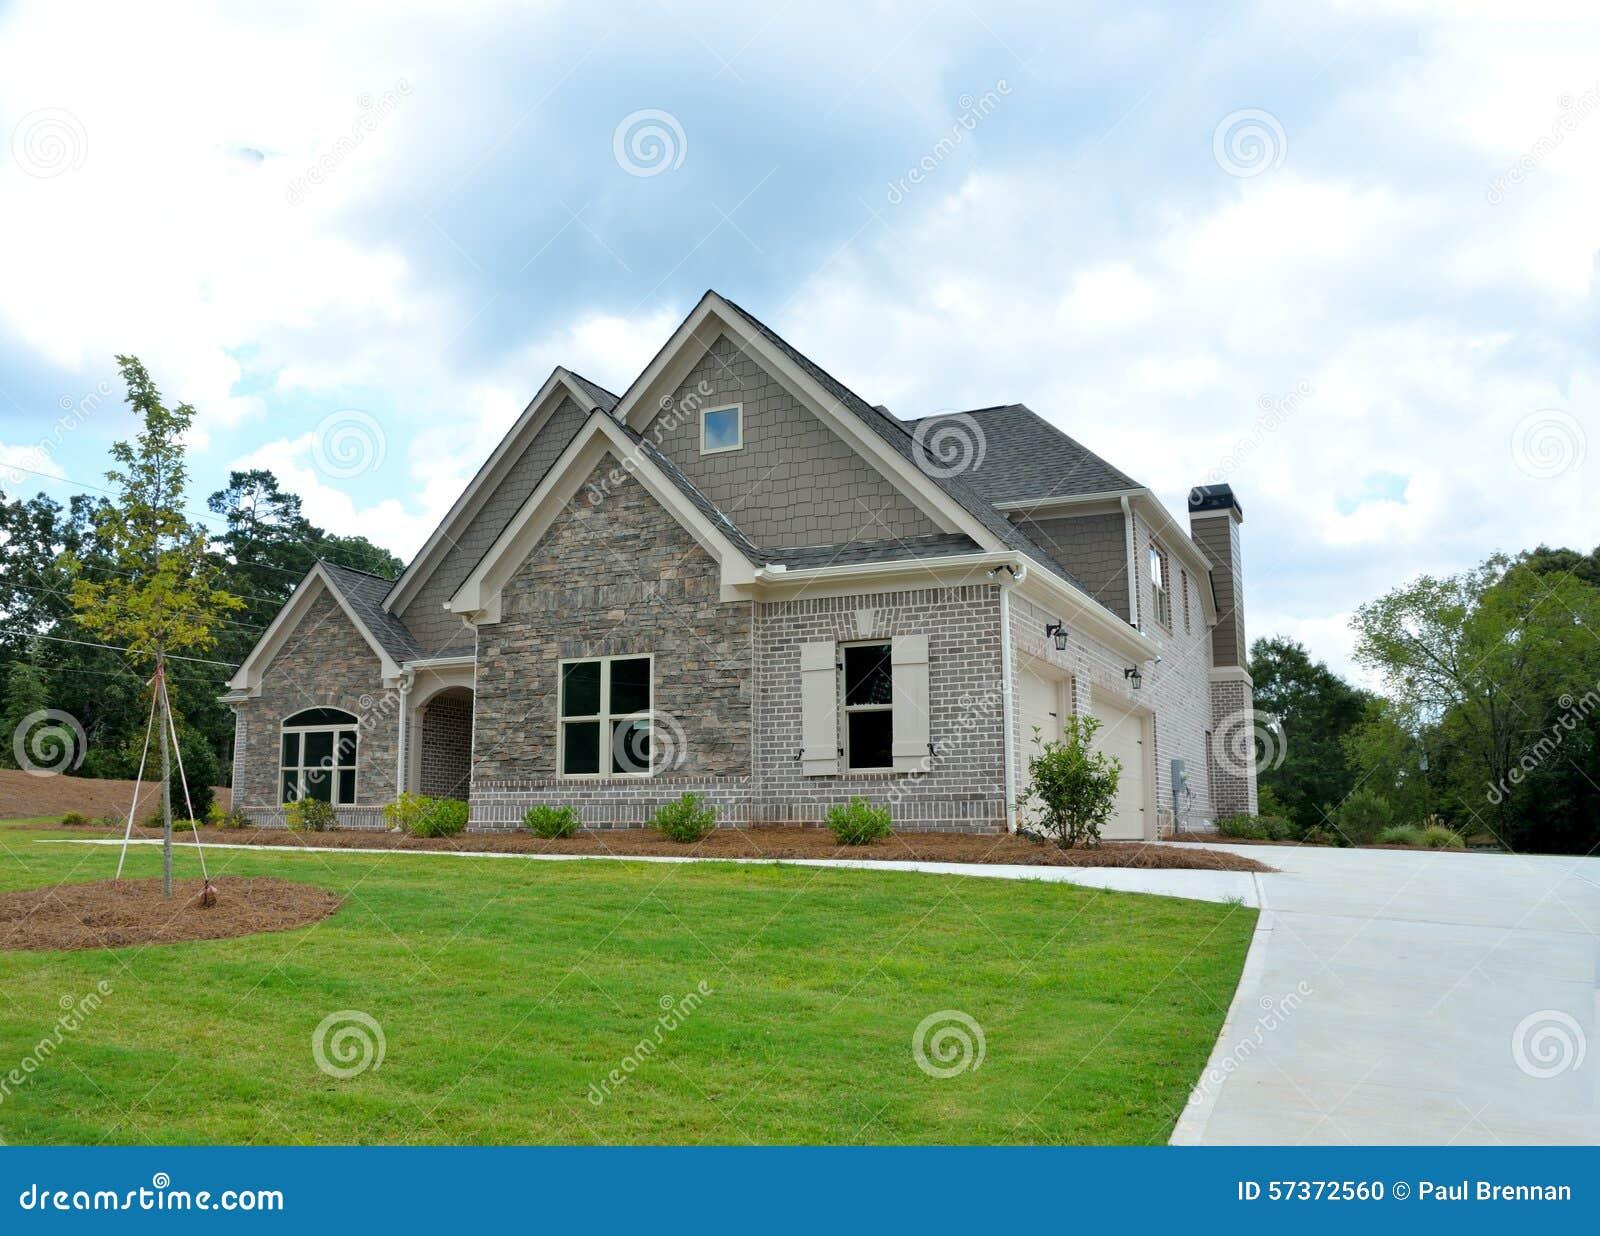 immobilien bogart georgia stockfoto bild 57372560. Black Bedroom Furniture Sets. Home Design Ideas